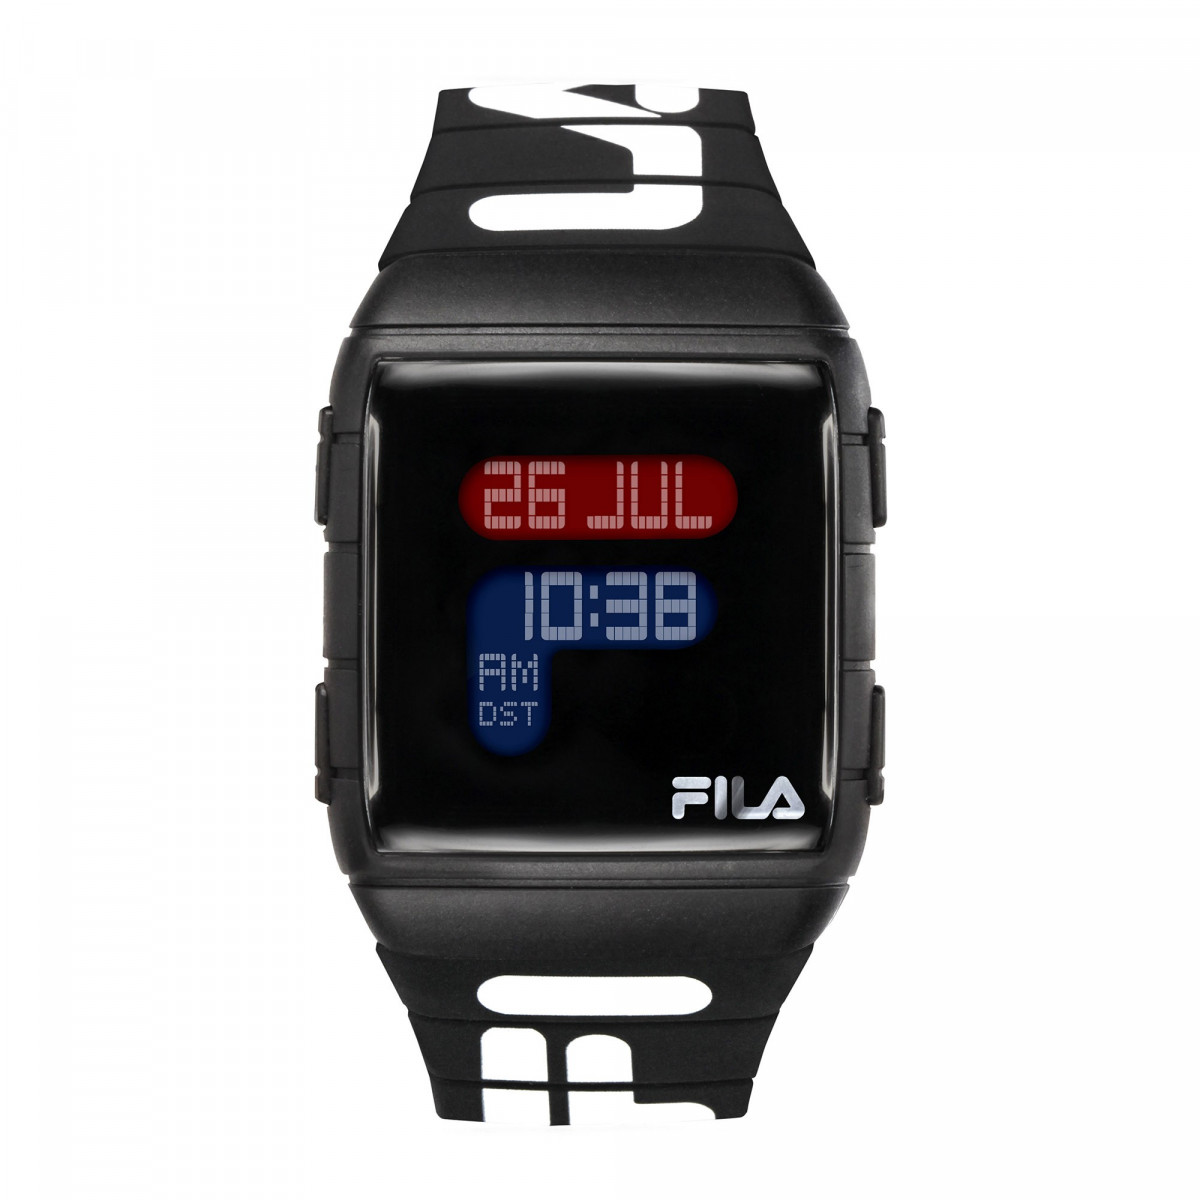 Montre mixte FILA digital cadran noir - 38-105-006